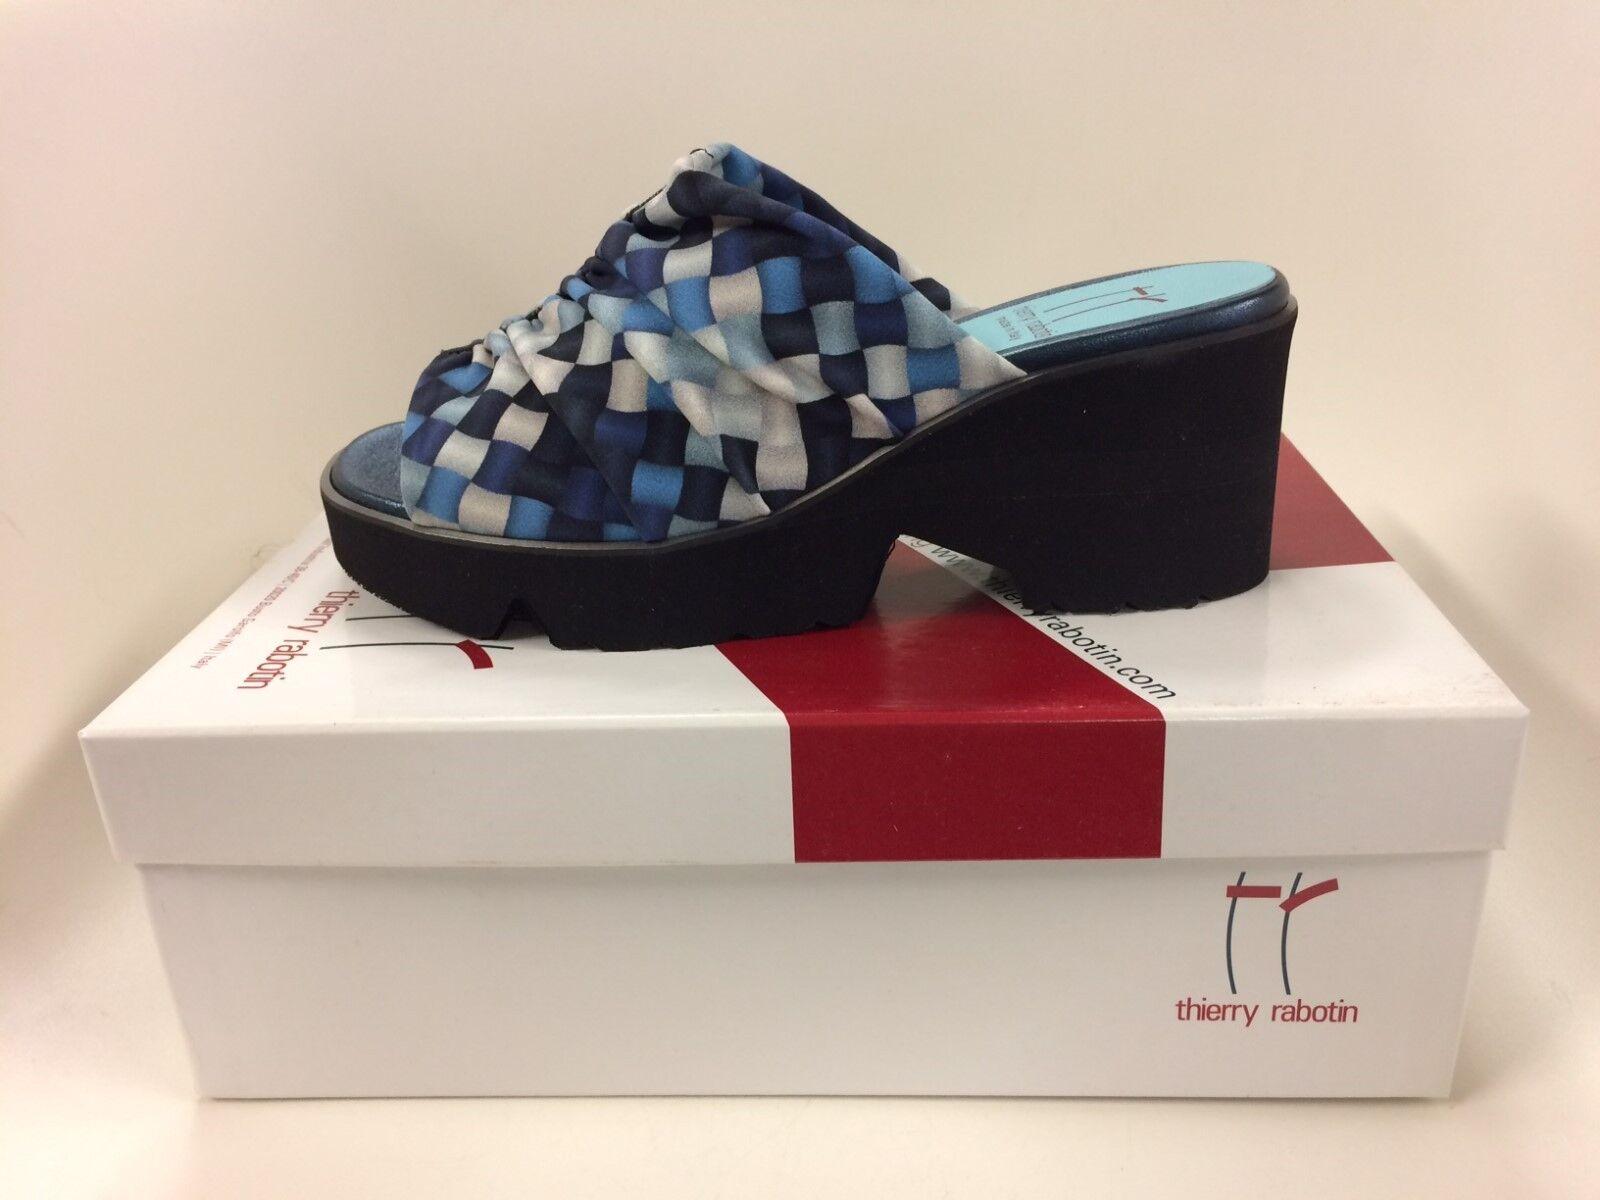 Thierry Rabotin bluesh Wash Navy Comfort Wedge Sandal Women's Sizes 36-42 NEW